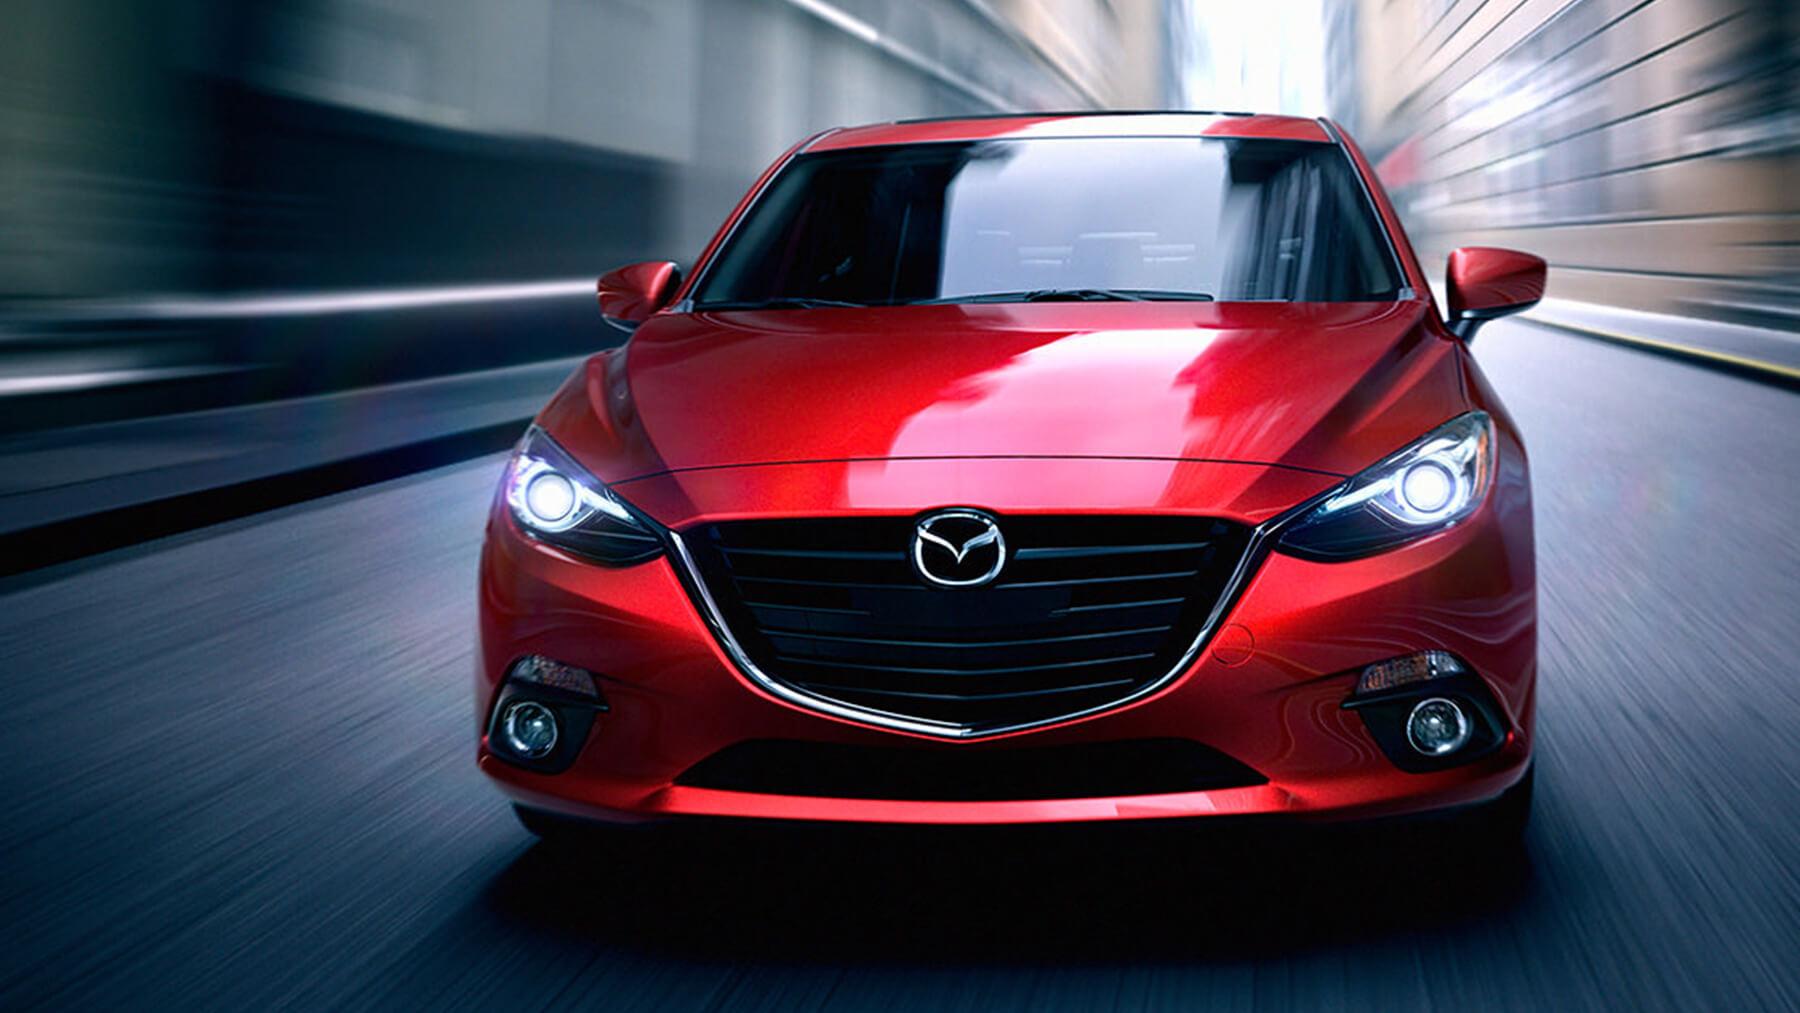 Mazda mazda 3 0-60 : Index of /assets/theme/seo-page-builder/images/2016/Mazda/Mazda3